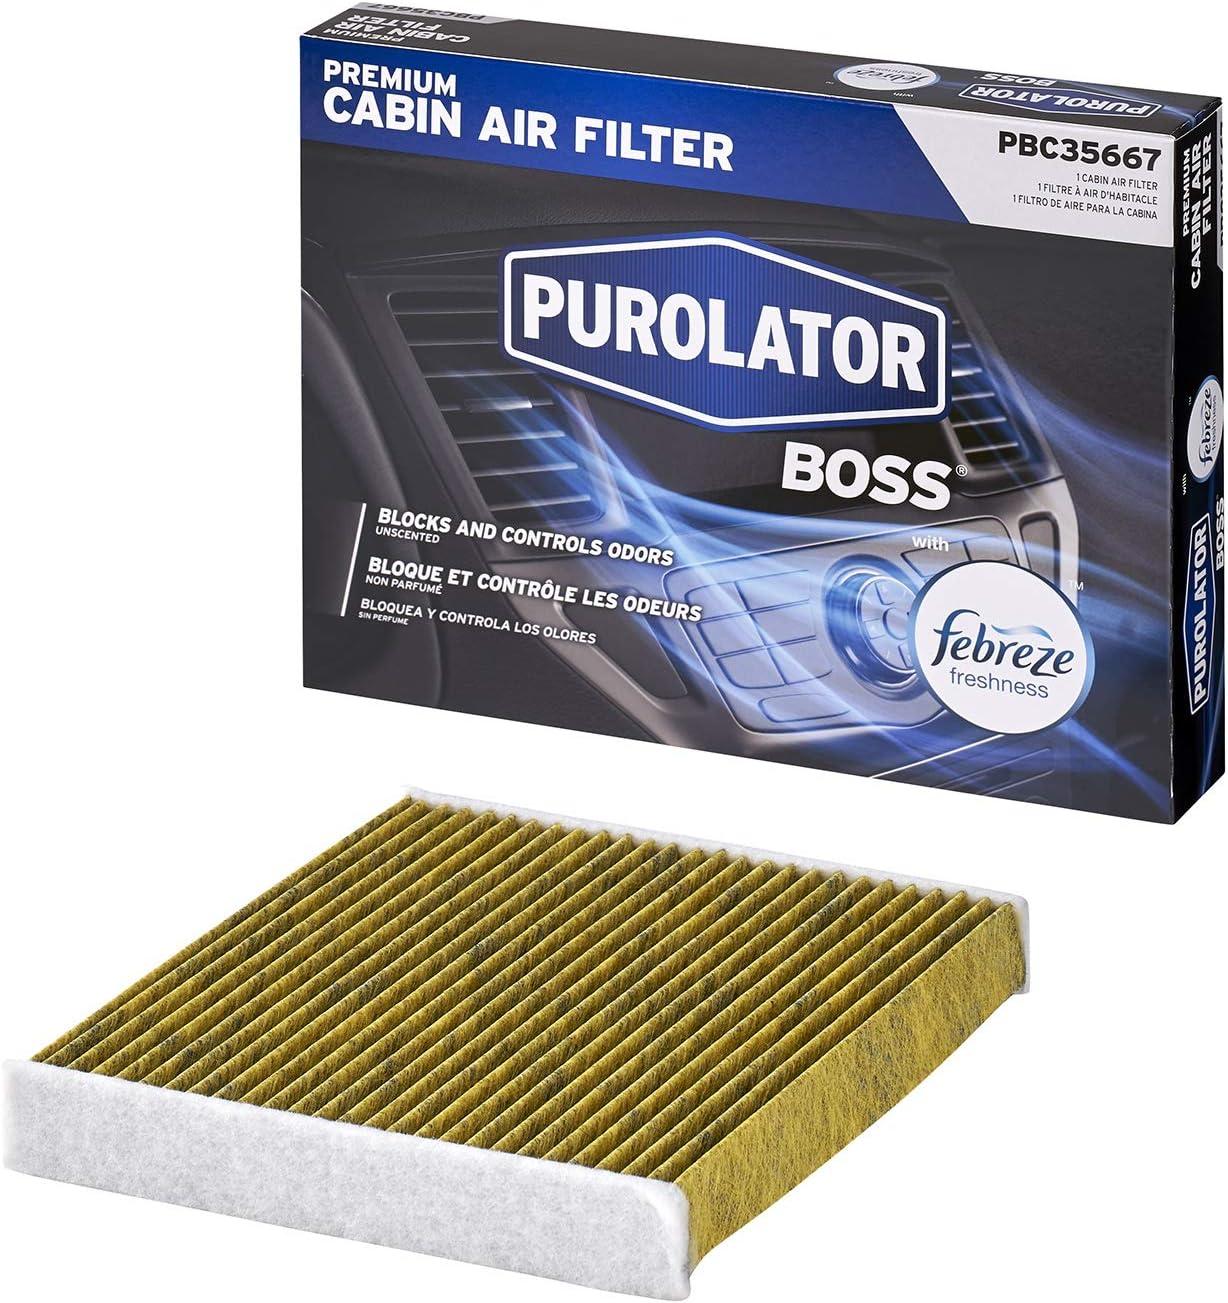 Purolator PBC35667 Cabin Air Filter